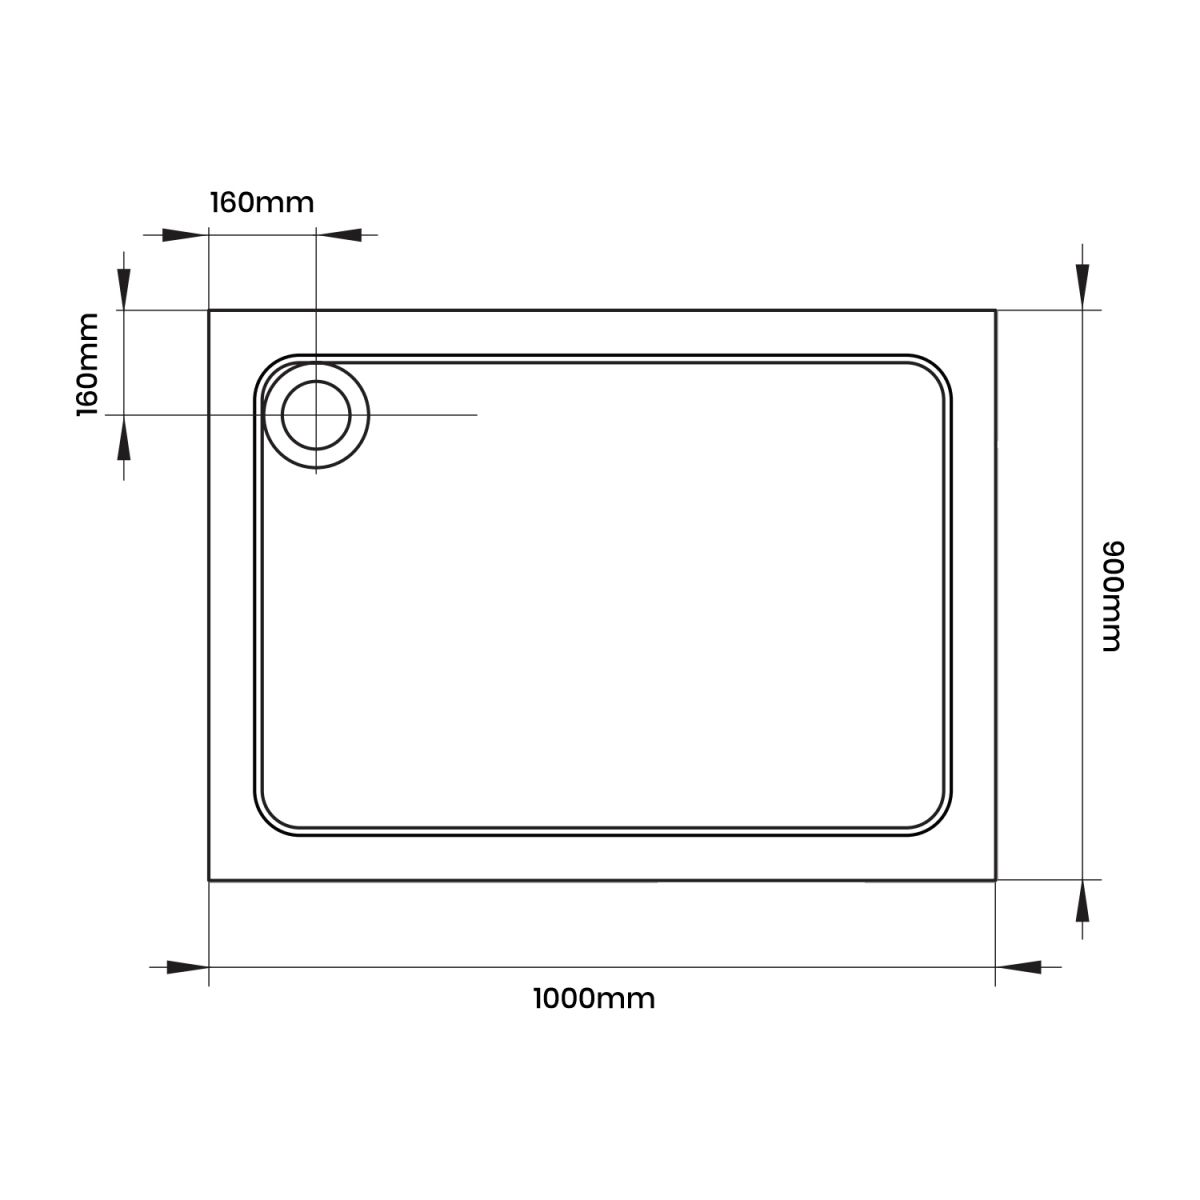 Aquadart Rectangular 1000 x 900 Shower Tray